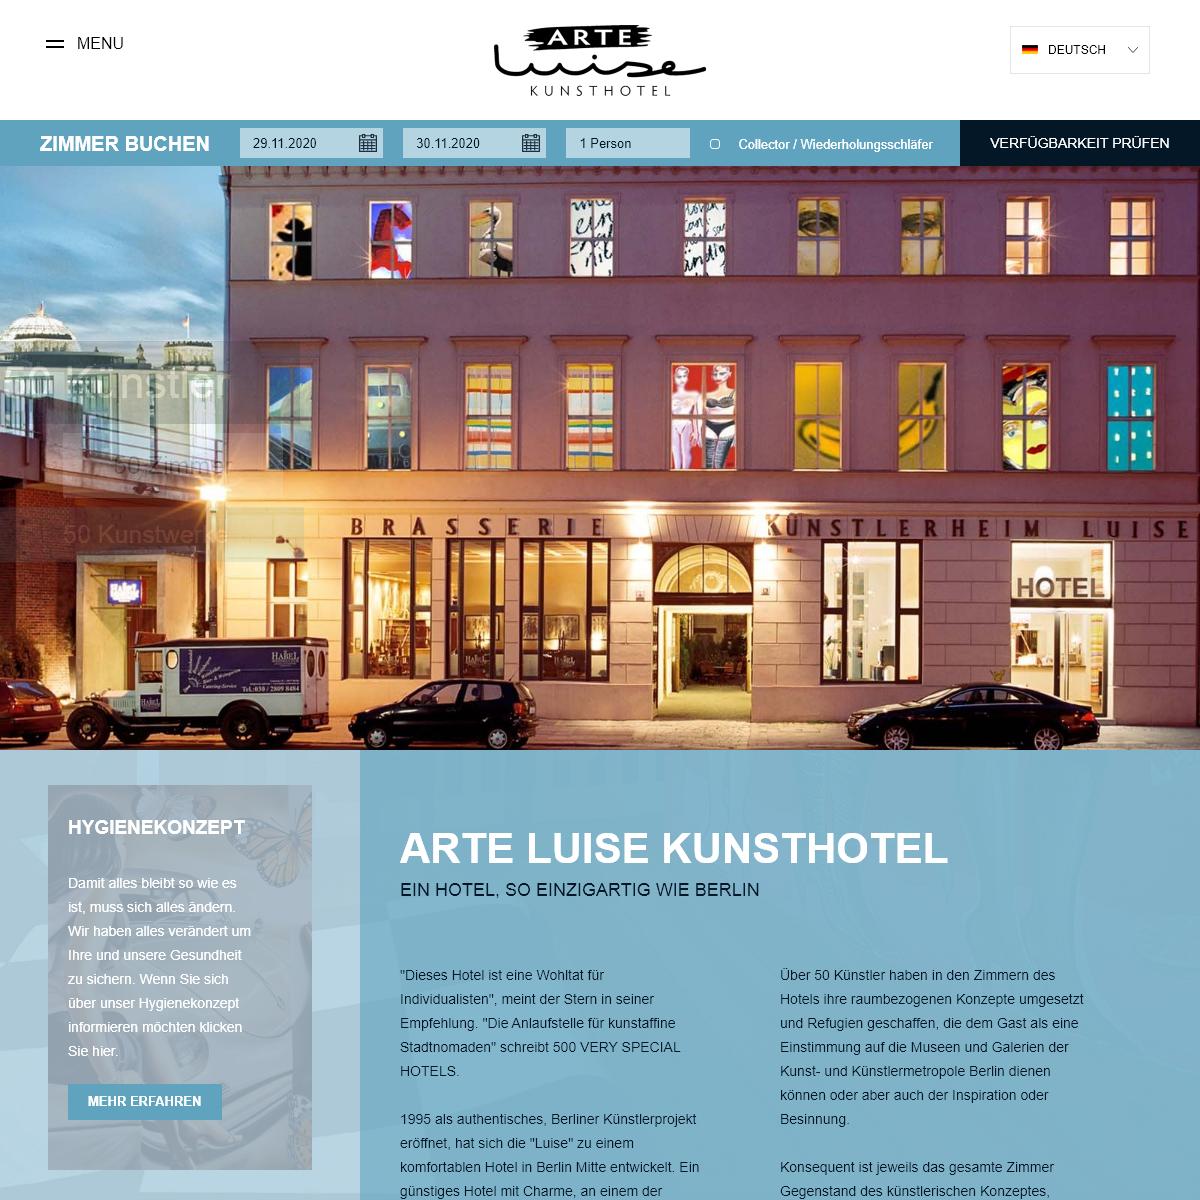 Charmantes Hotel in Berlin Mitte - Arte Luise